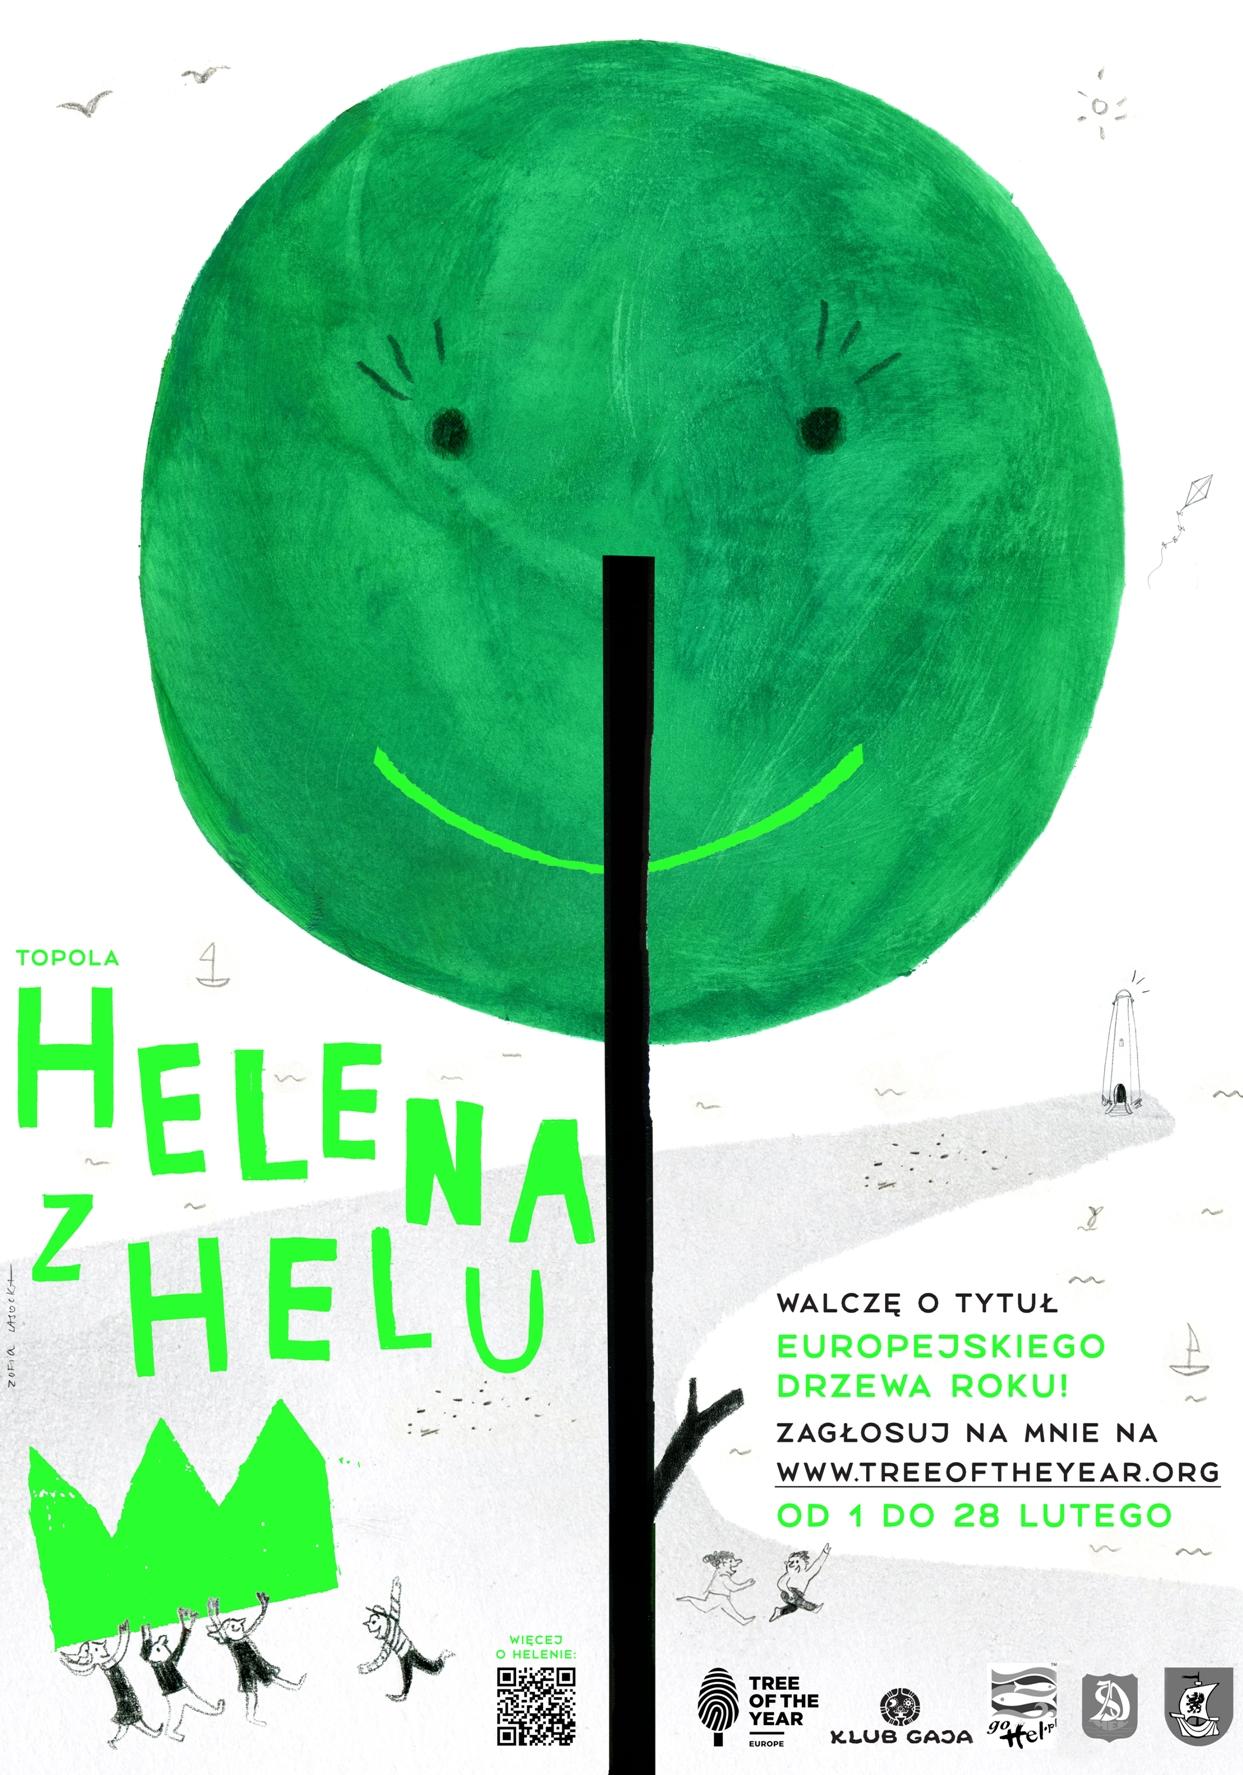 Topola Helena z Helu - plakat